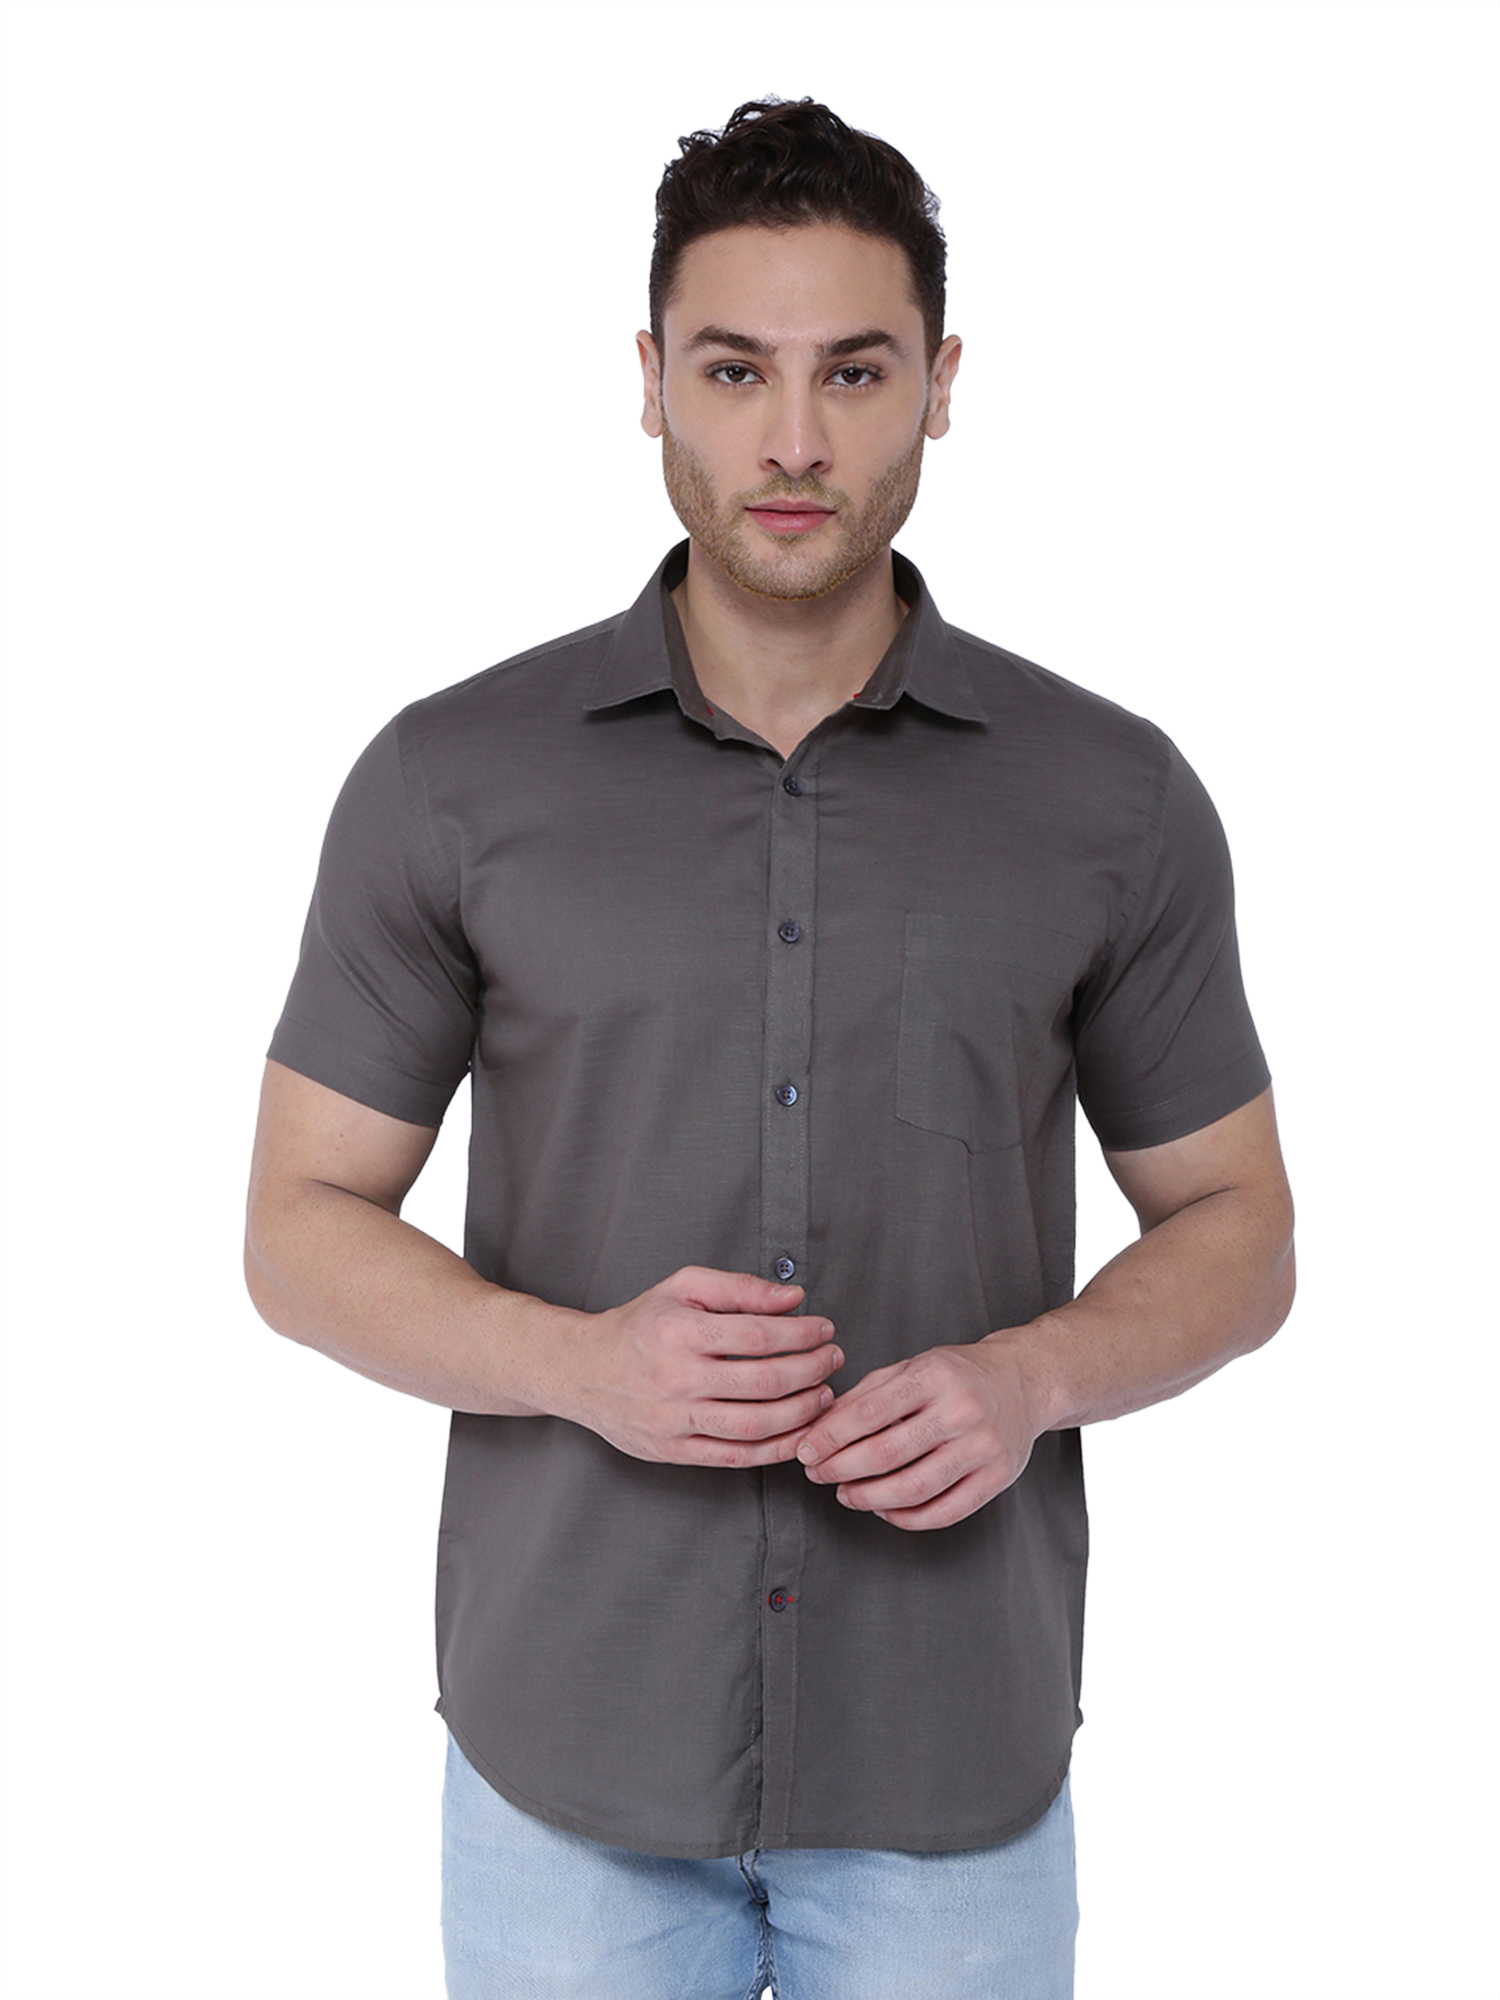 Southbay | Southbay Men's Dark Grey Half Sleeve Linen Cotton Formal Shirt-SBCLHS236GY